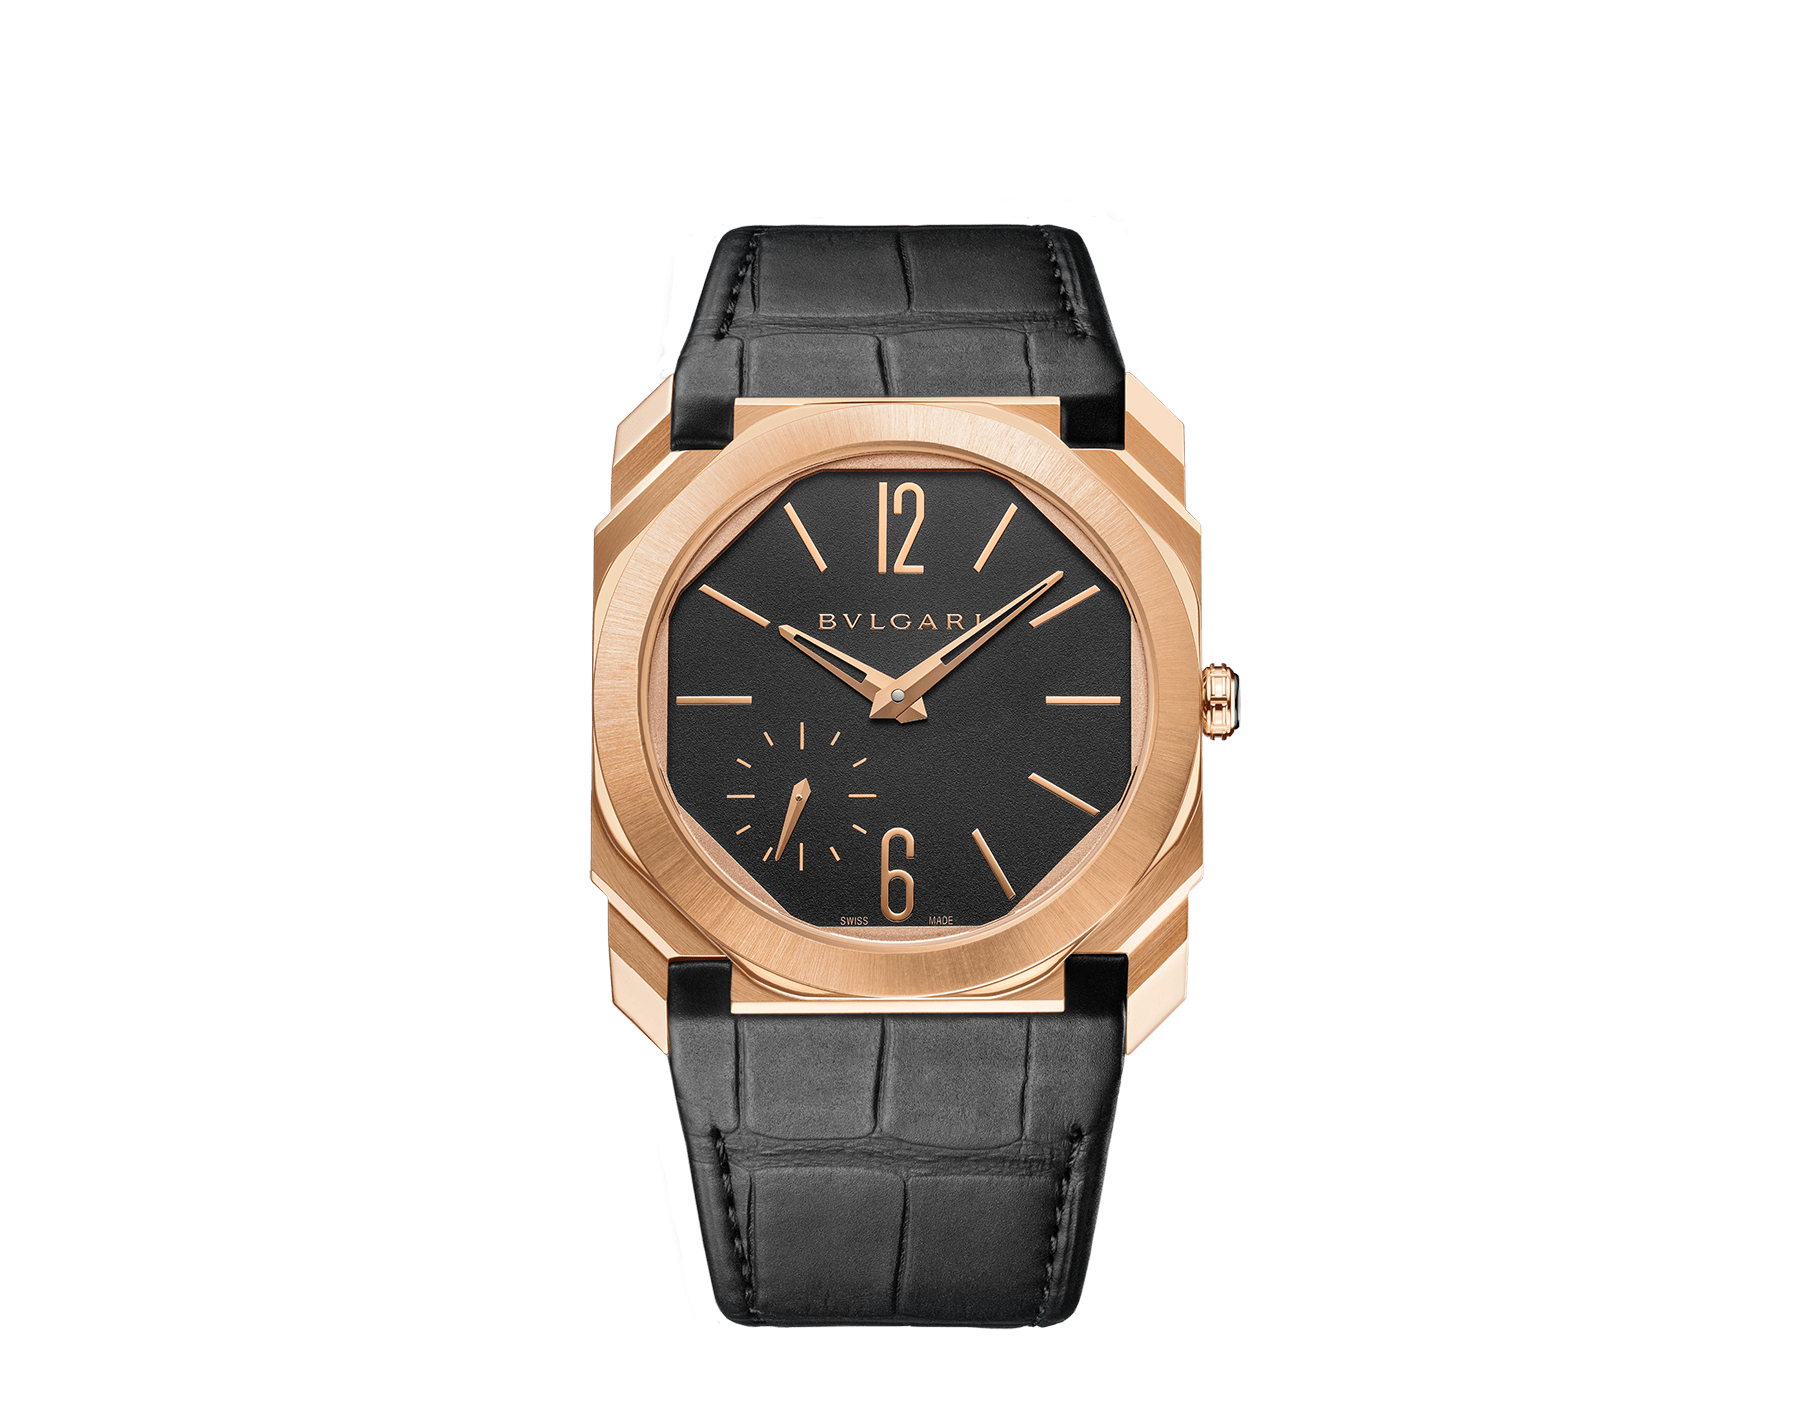 Octo Finissimo Automatic 超薄自動腕錶,搭載機械機芯,自動上鍊,鉑金微型自動盤,小秒針盤。18K 玫瑰金緞面拋光超薄錶殼,透明底蓋。黑色霧面錶盤,黑色鱷魚皮錶帶。防水深度 100 公尺。 103286 image 1